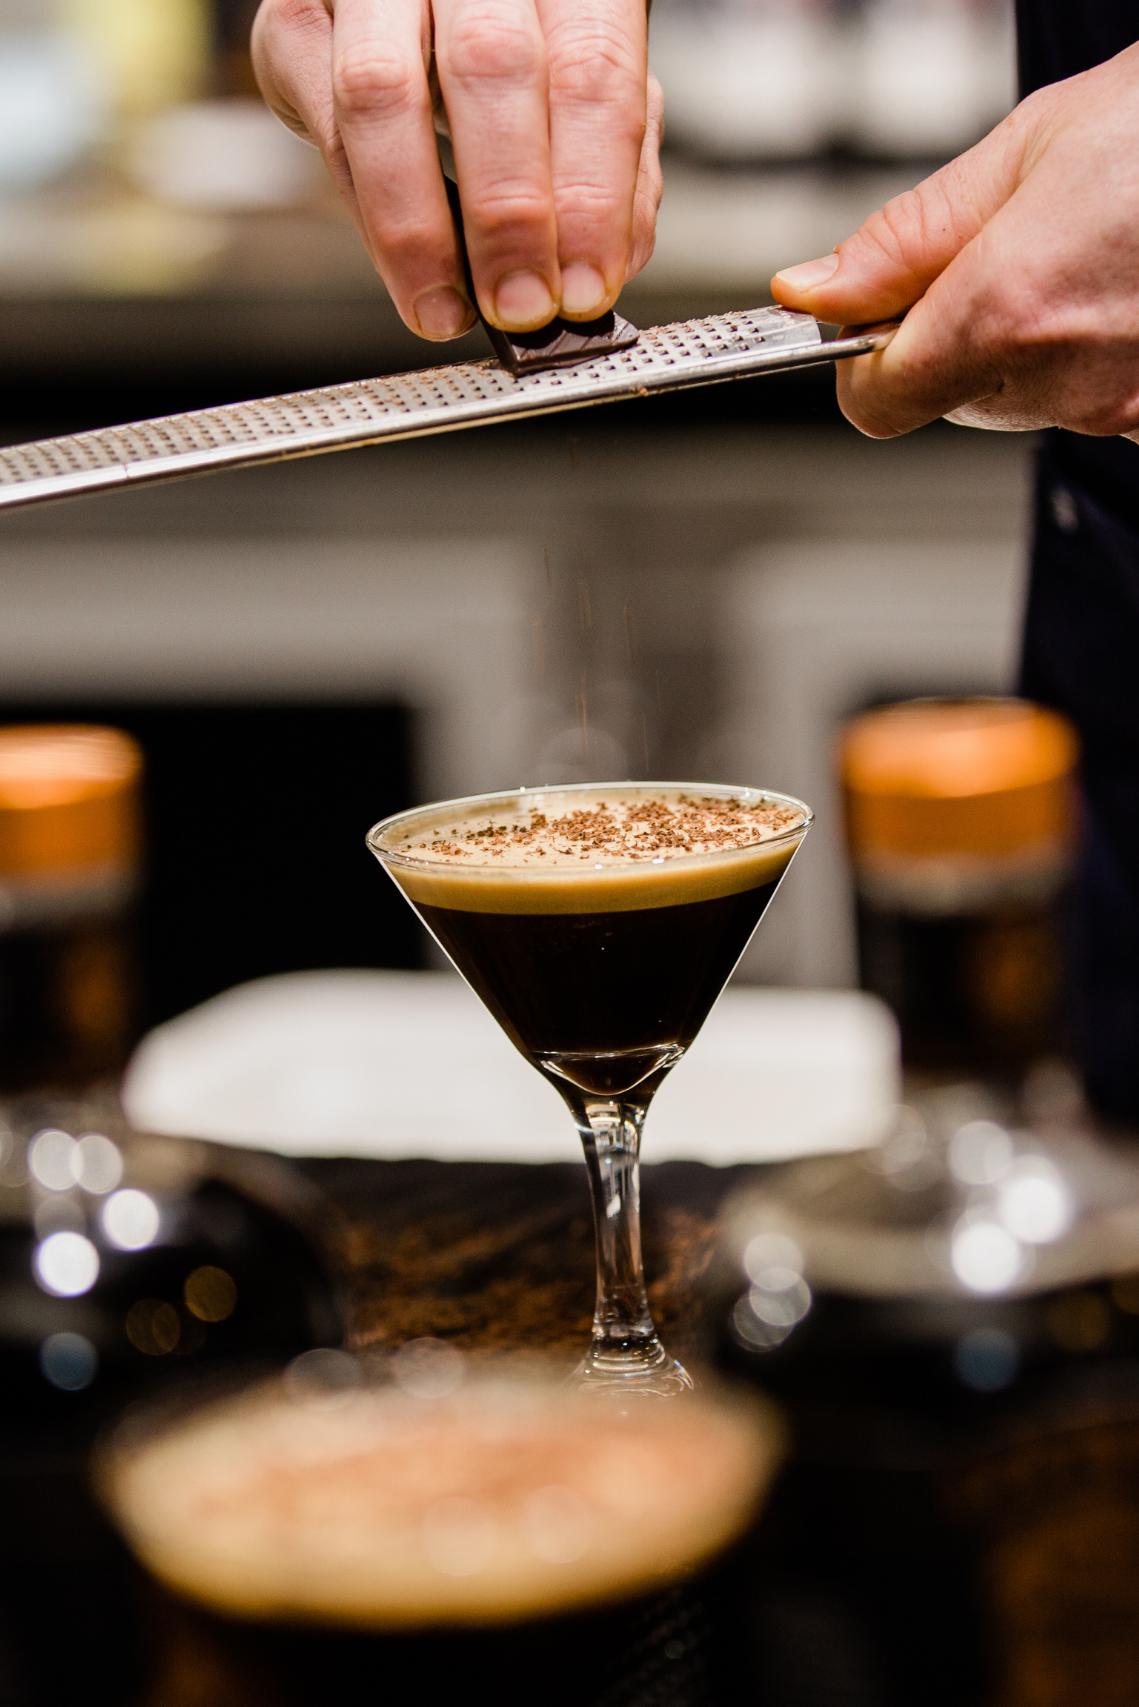 espresso martini with grated chocolate